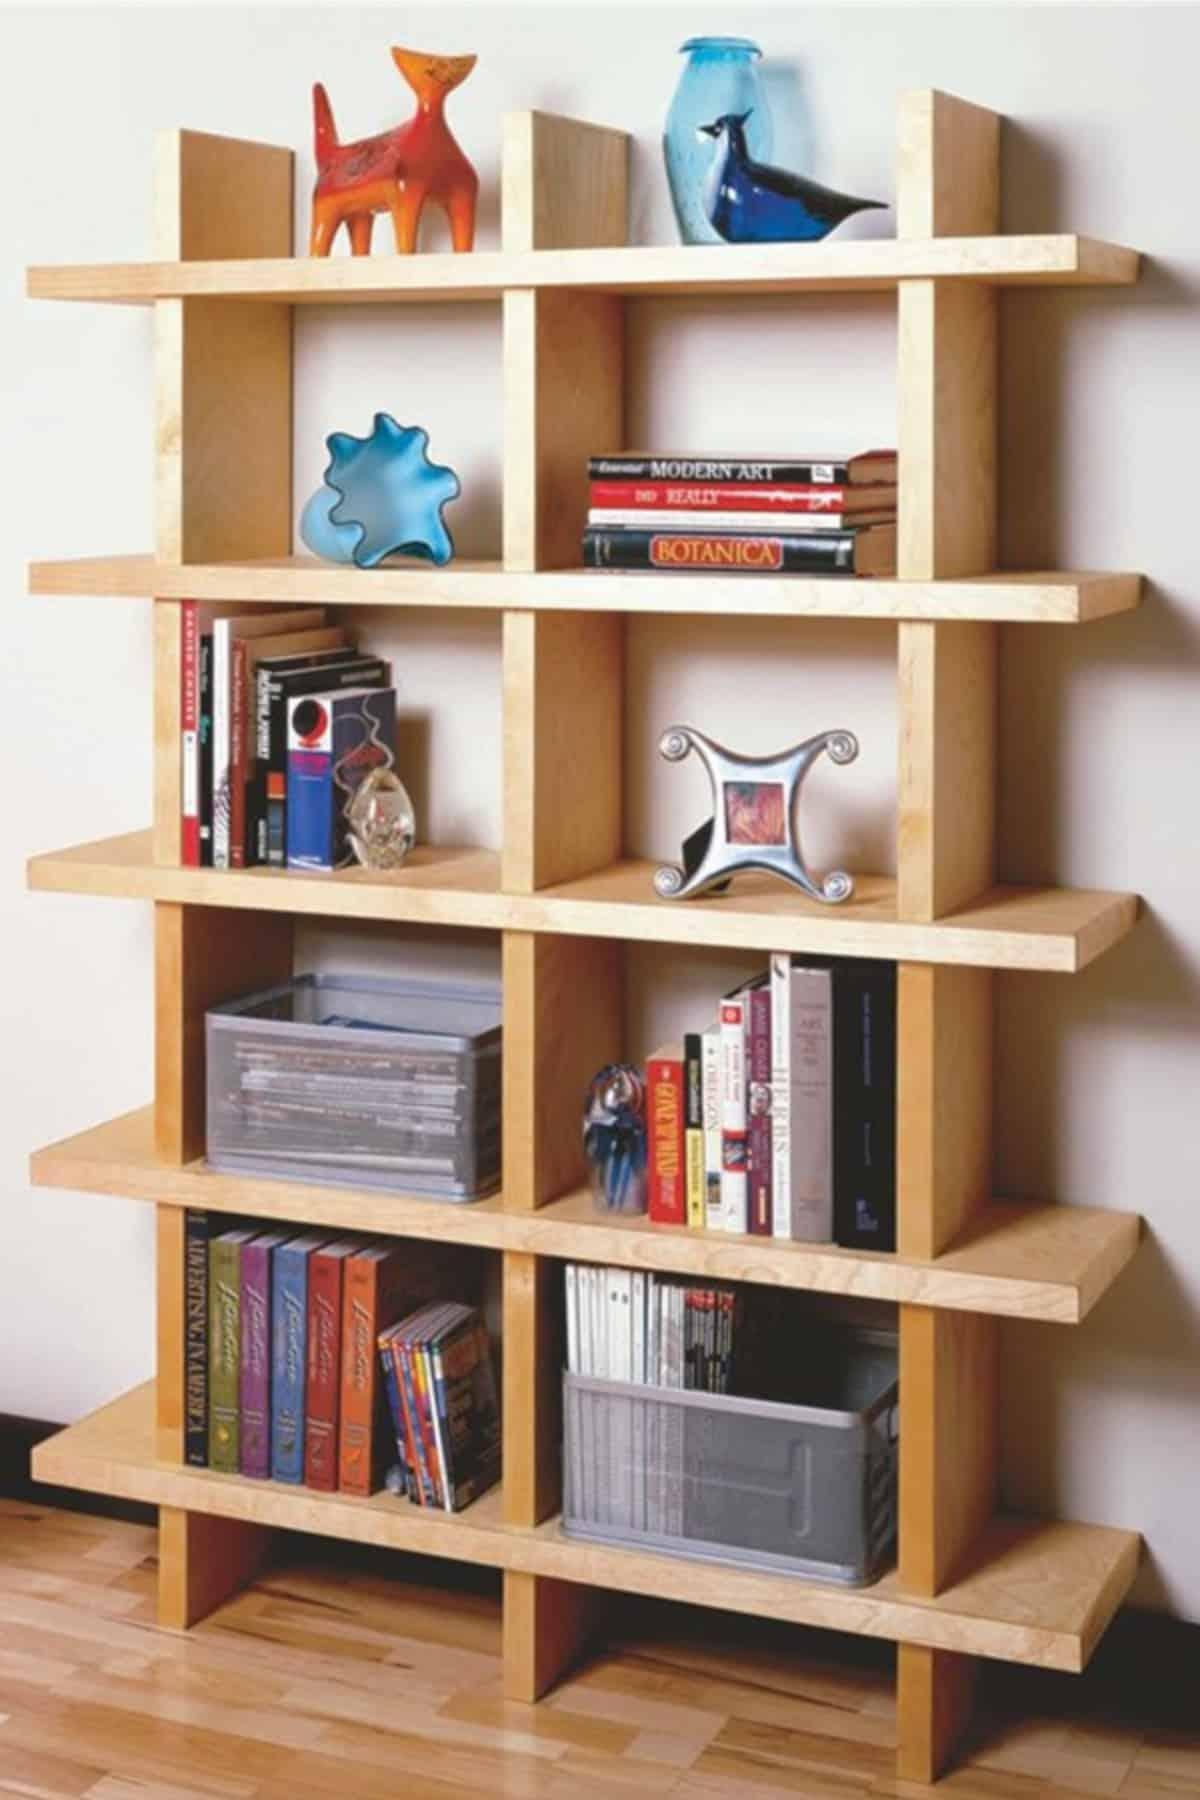 Contemporary-style Bookshelf